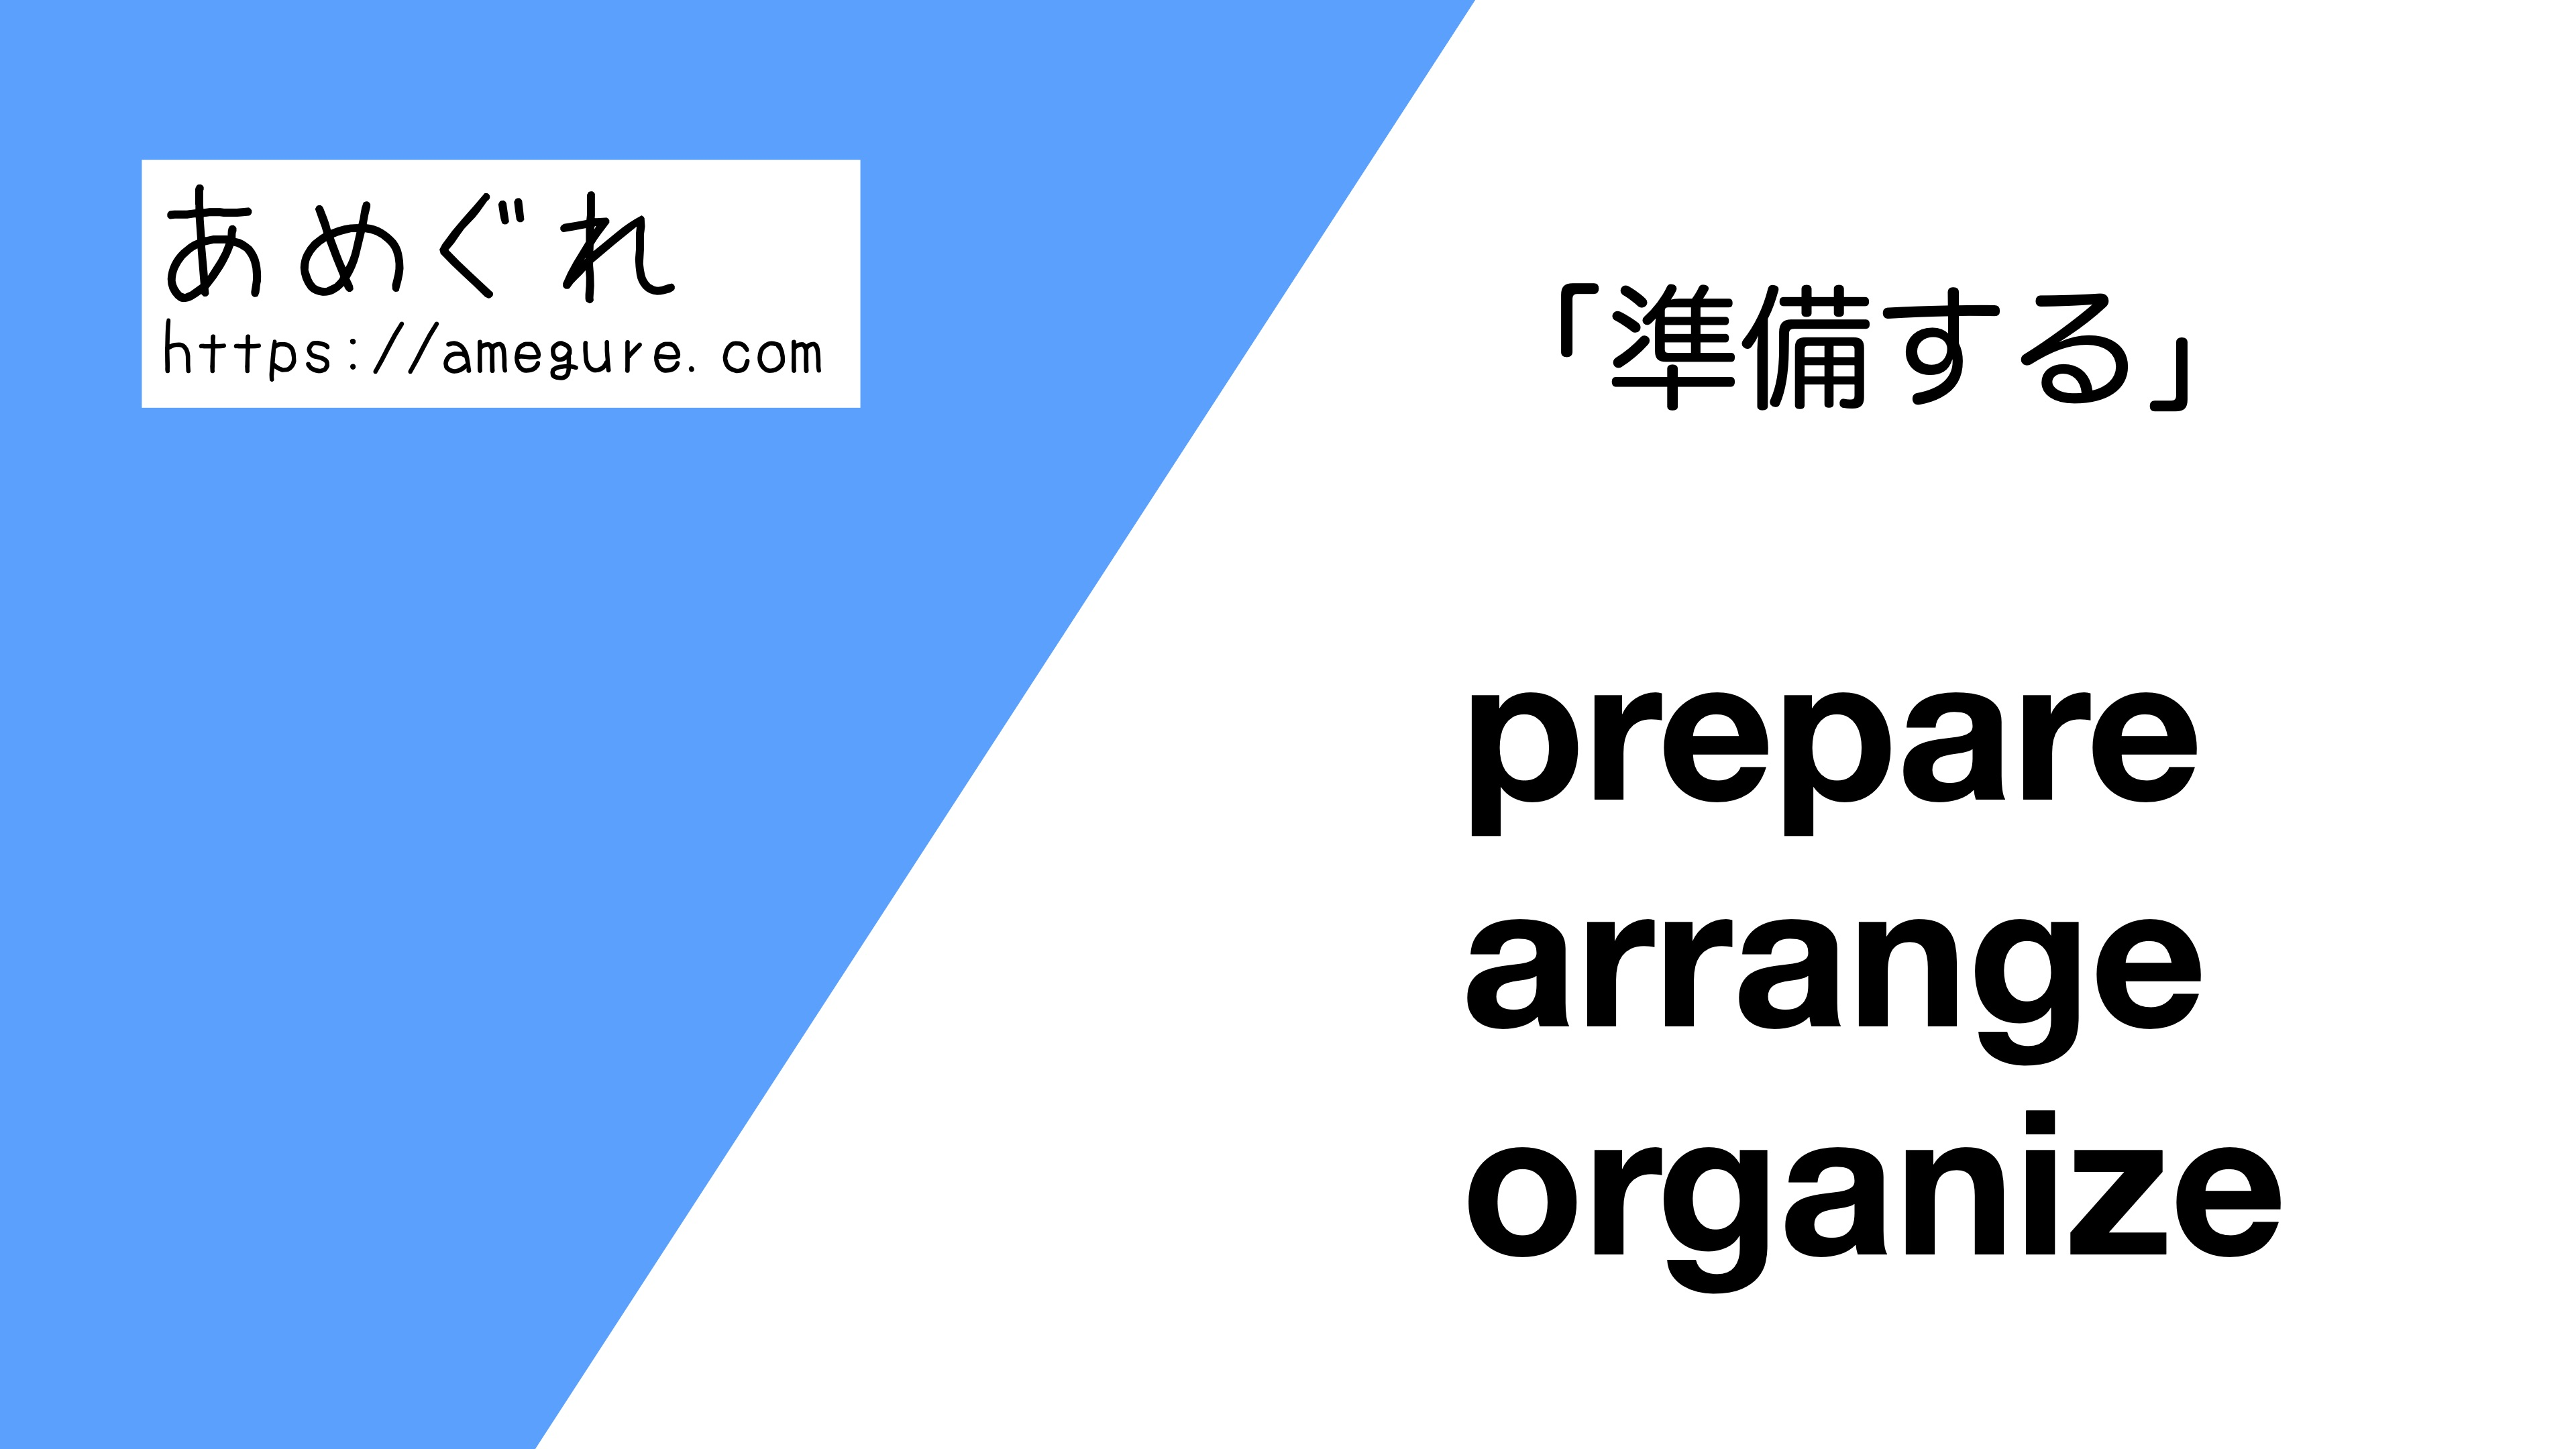 prepare-arrange-organize違い